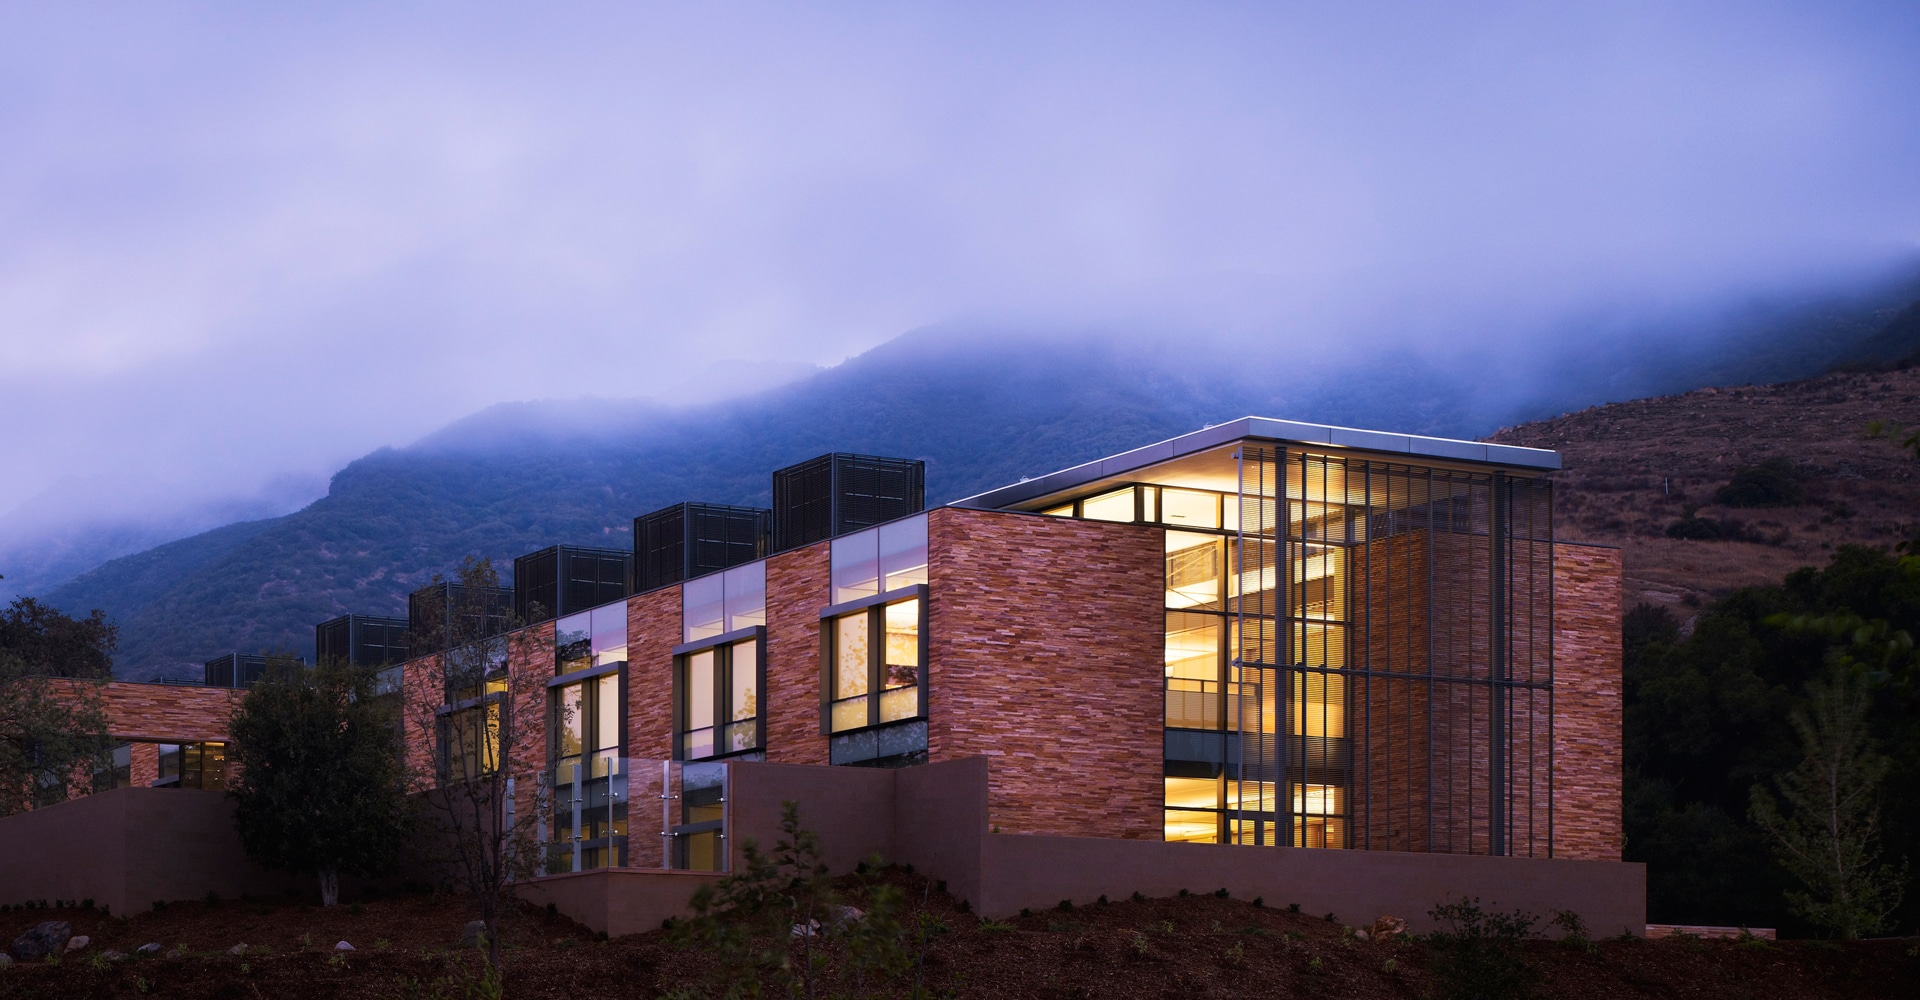 Conrad N. Hilton Foundation Headquarters - Agoura Hills, CA